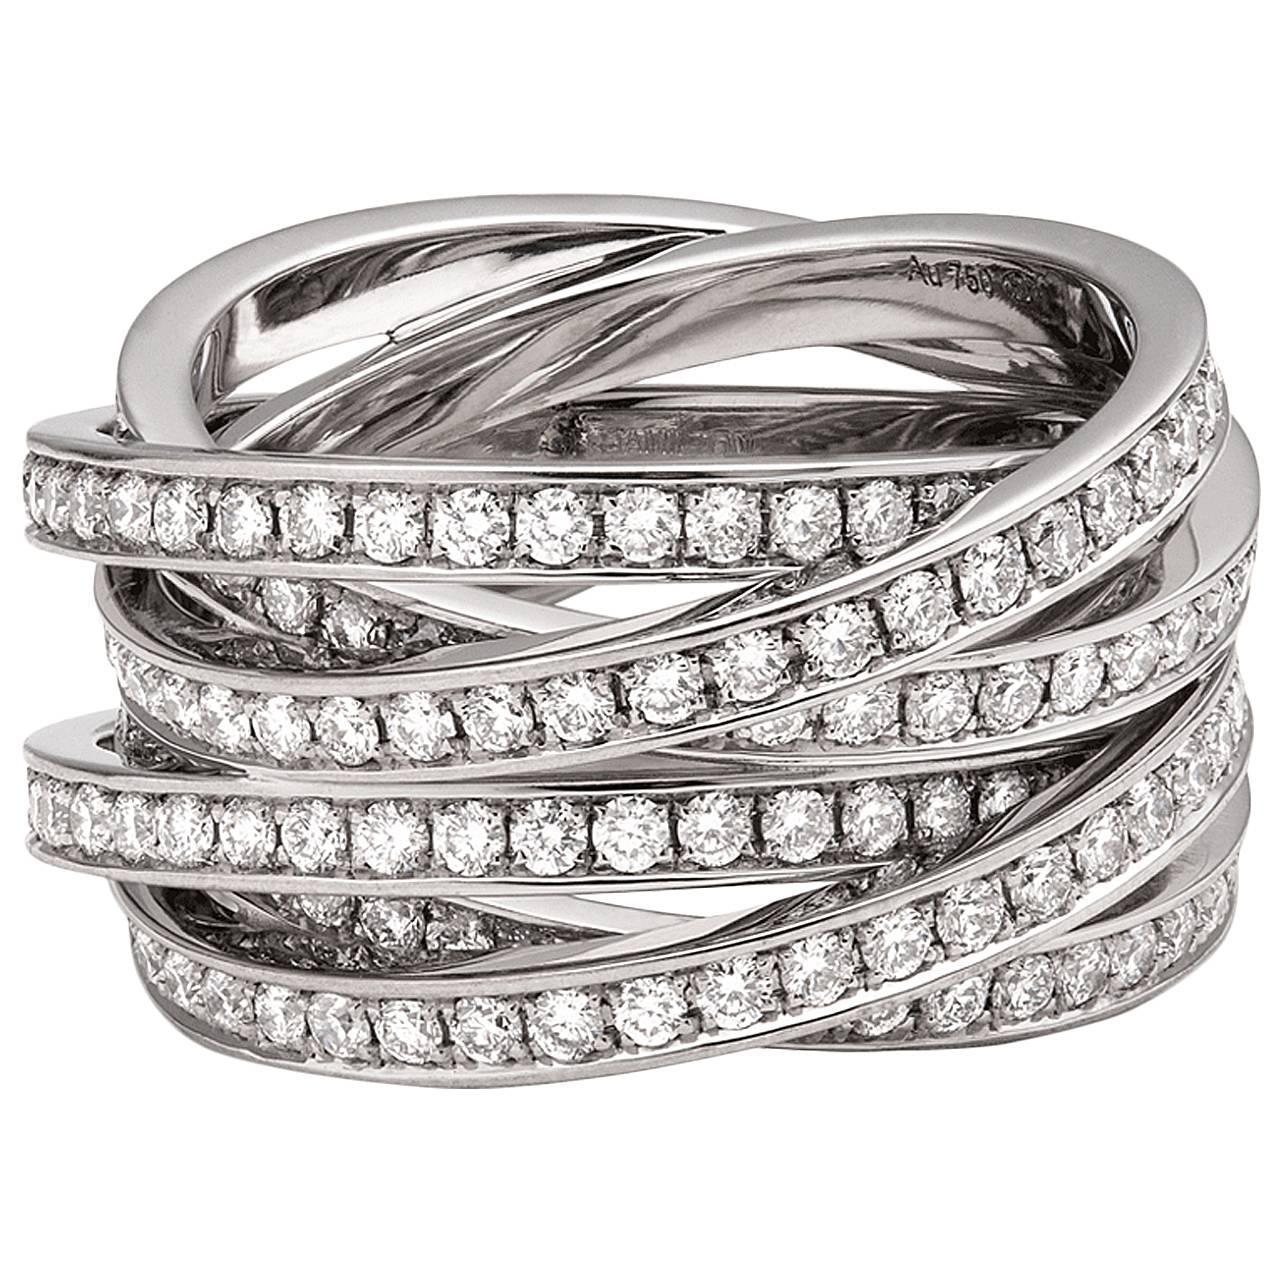 diamond gold multi row interlocking ring at 1stdibs. Black Bedroom Furniture Sets. Home Design Ideas